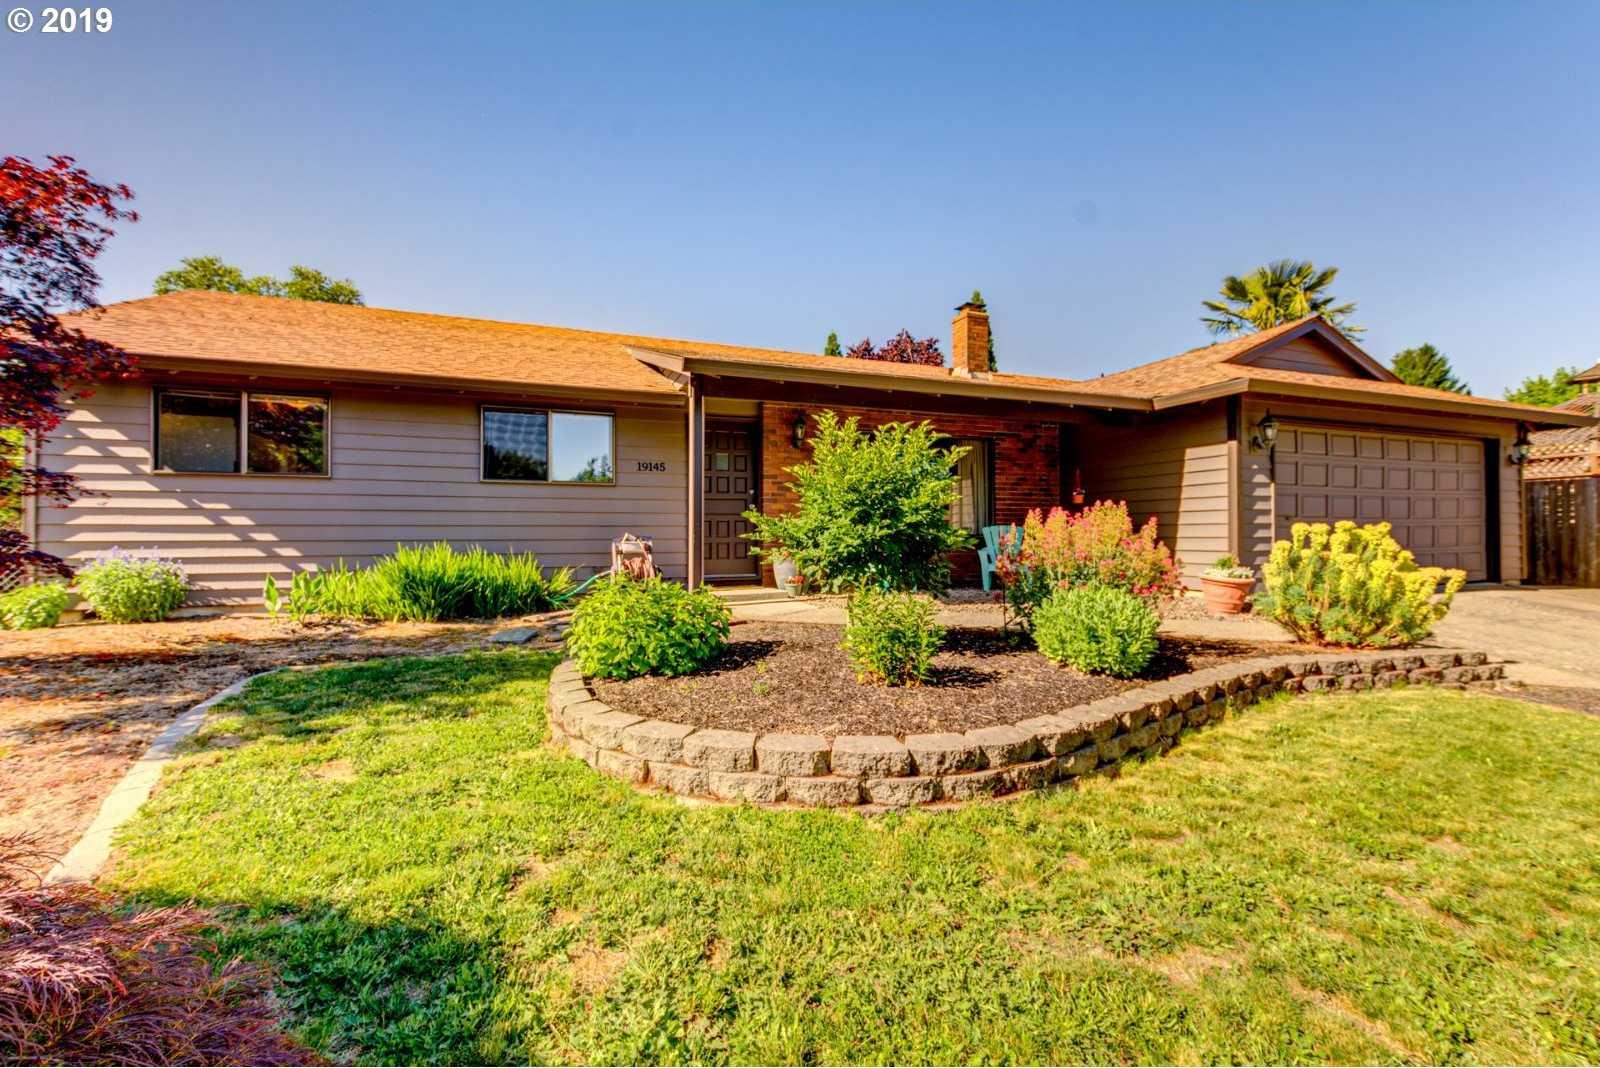 $395,000 - 3Br/2Ba -  for Sale in Willow Creek, Beaverton